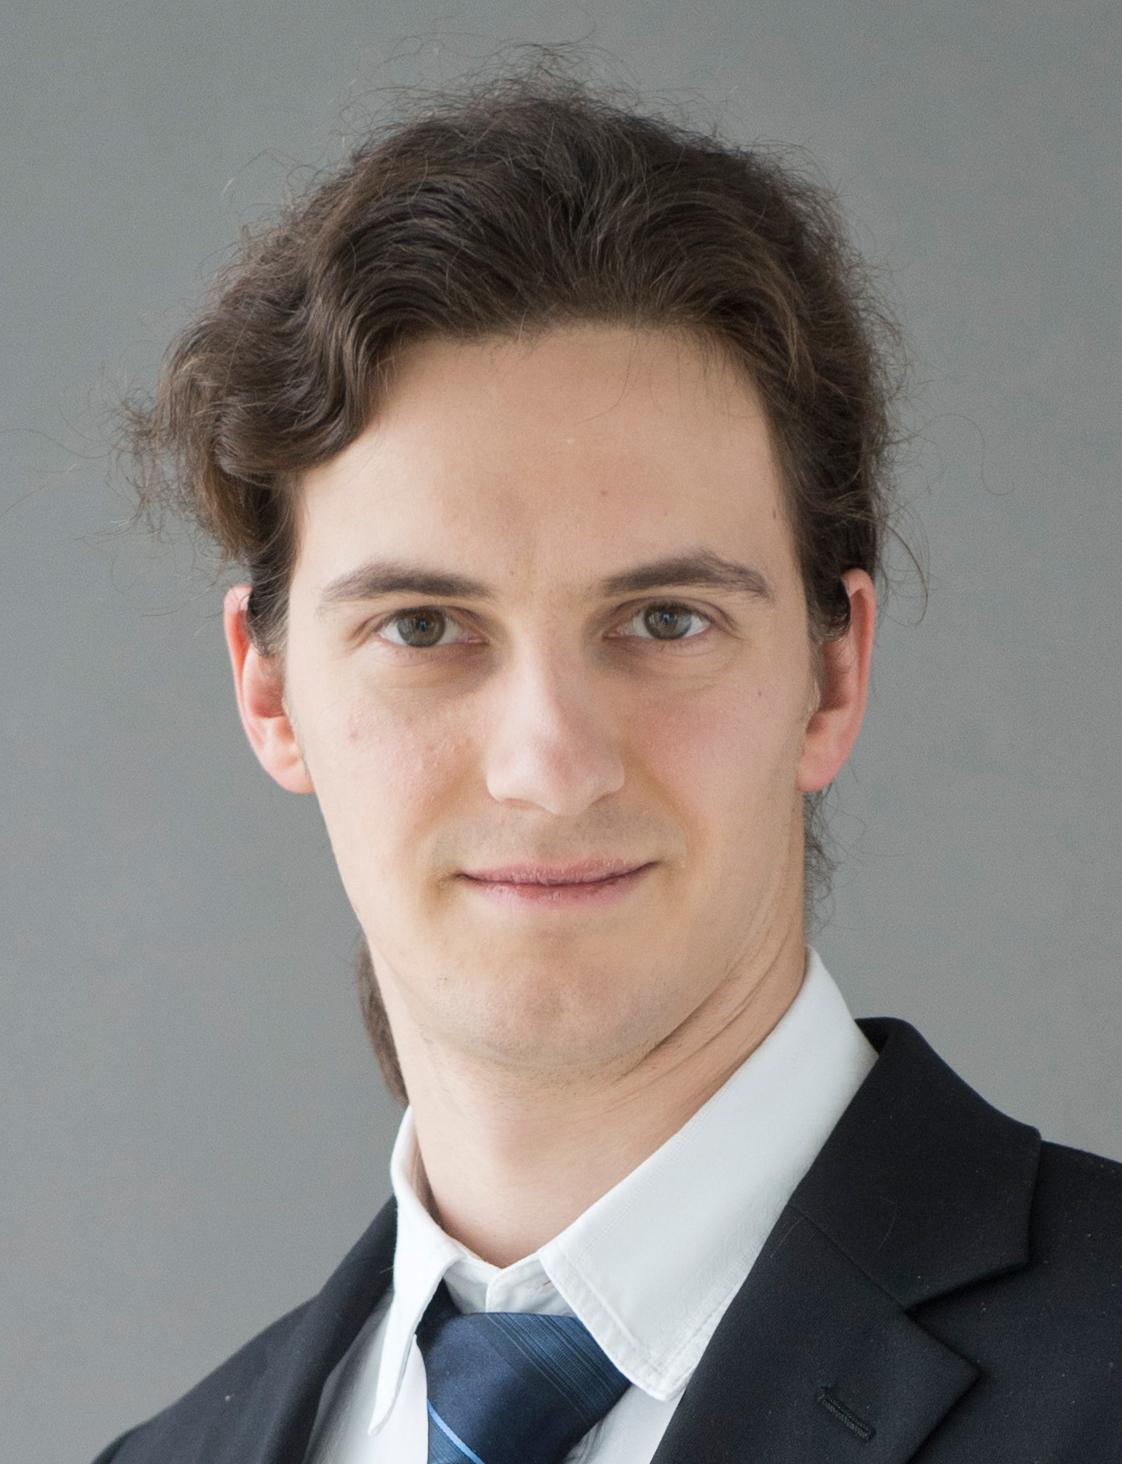 Sebastian Sauerbier